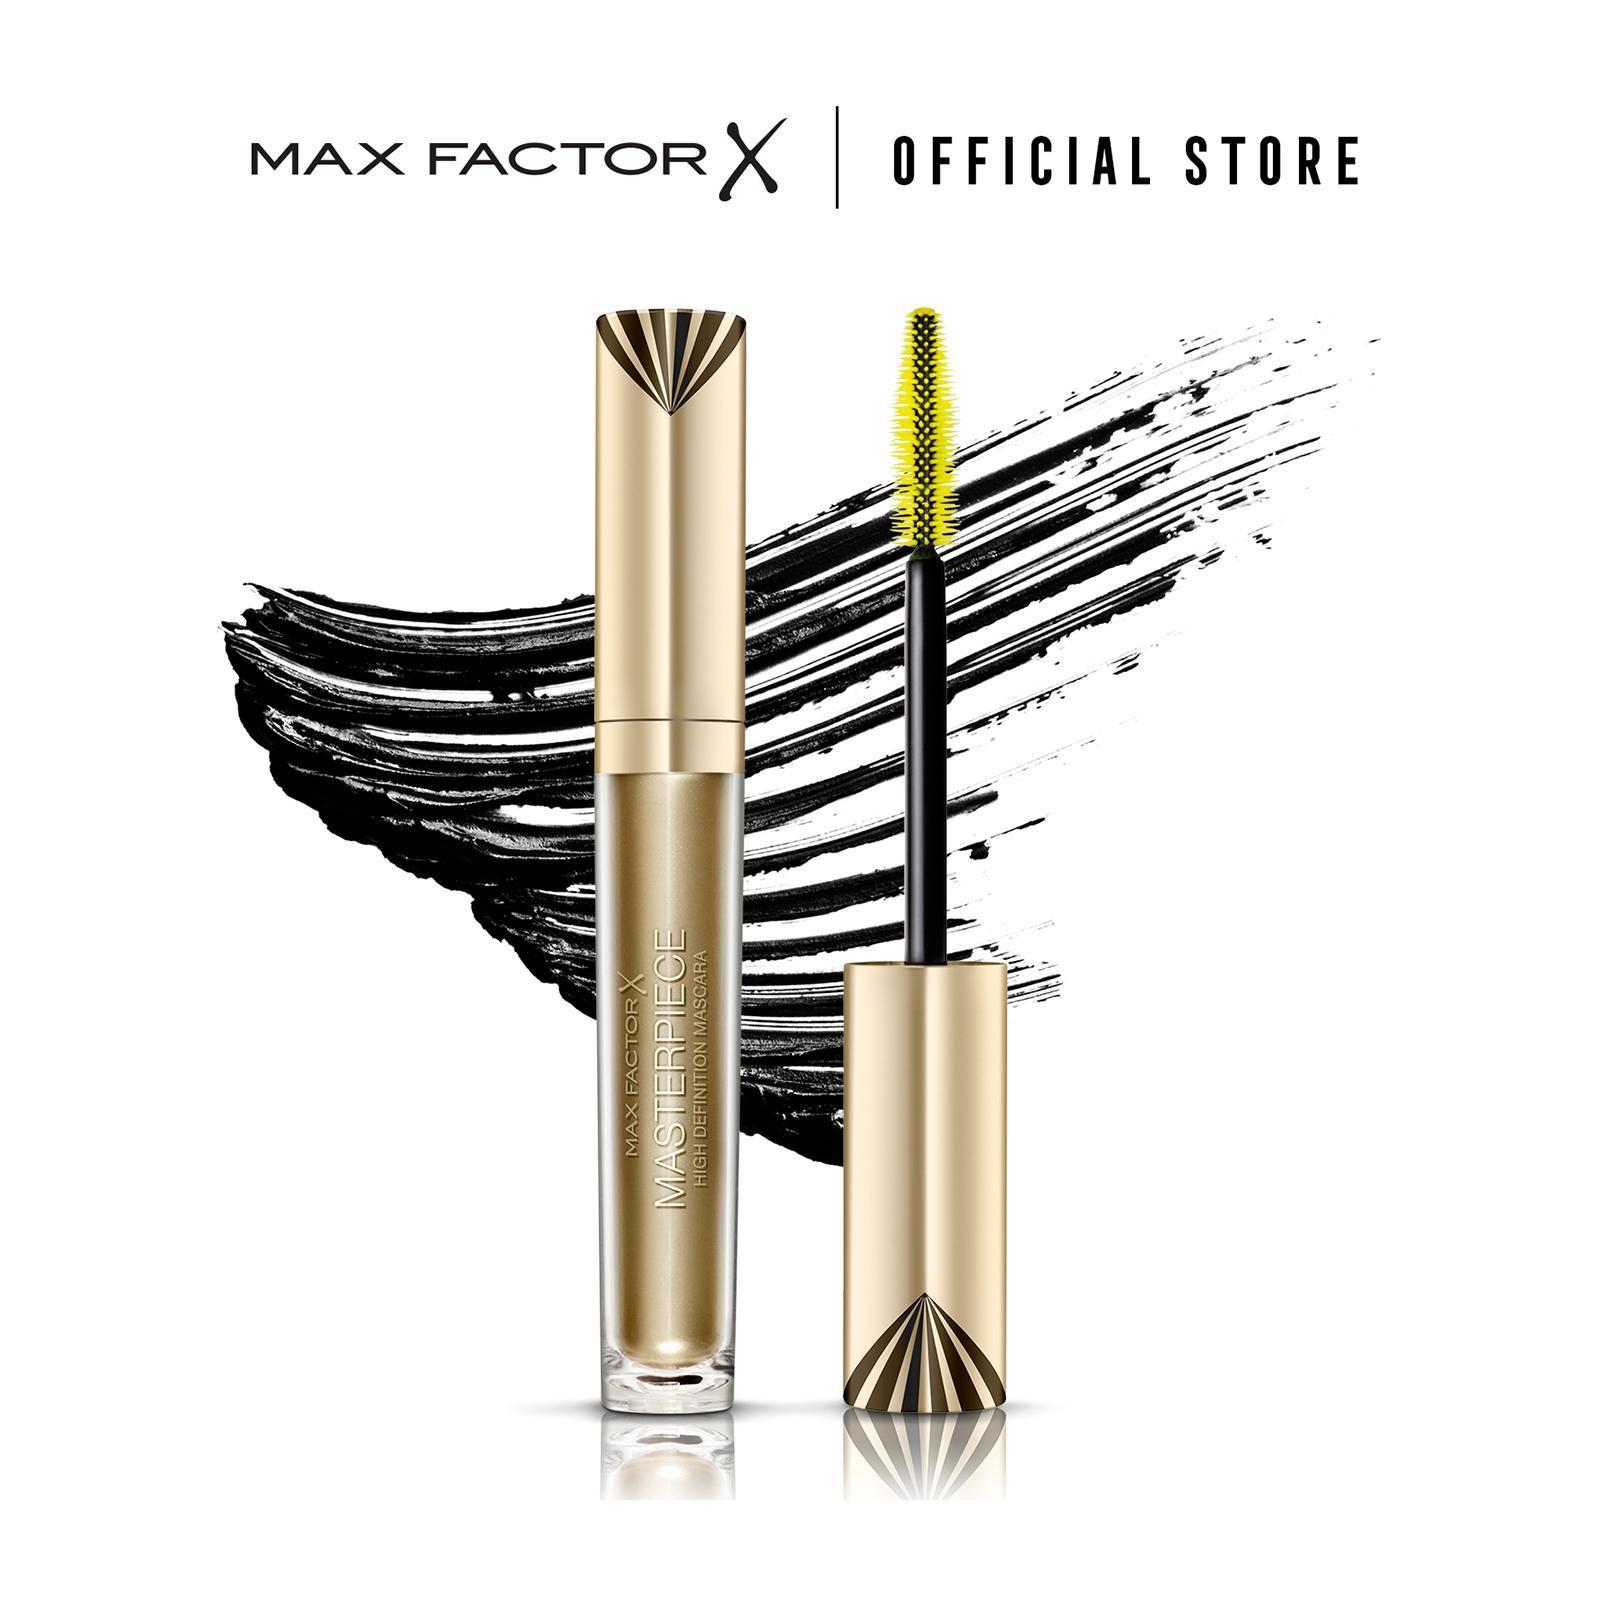 Max Factor Masterpiece Waterproof Mascara 001 Black